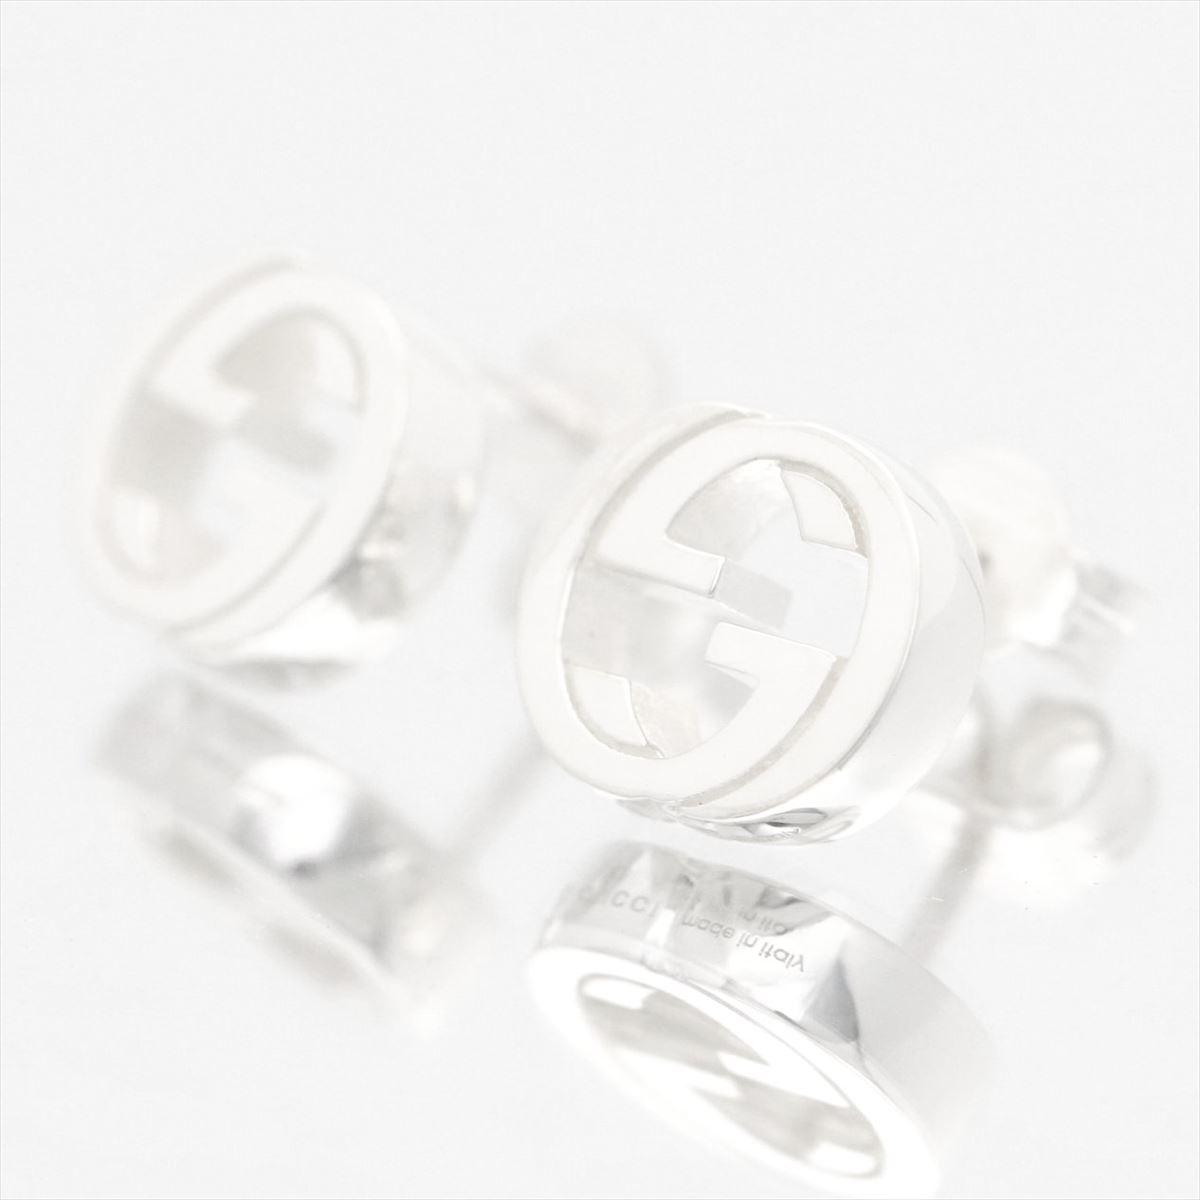 a444d2a3999 Gucci  GUCCI Lady s jewelry GG logo stud bolt pierced earrings silver Ag925  356289-J8400-0702